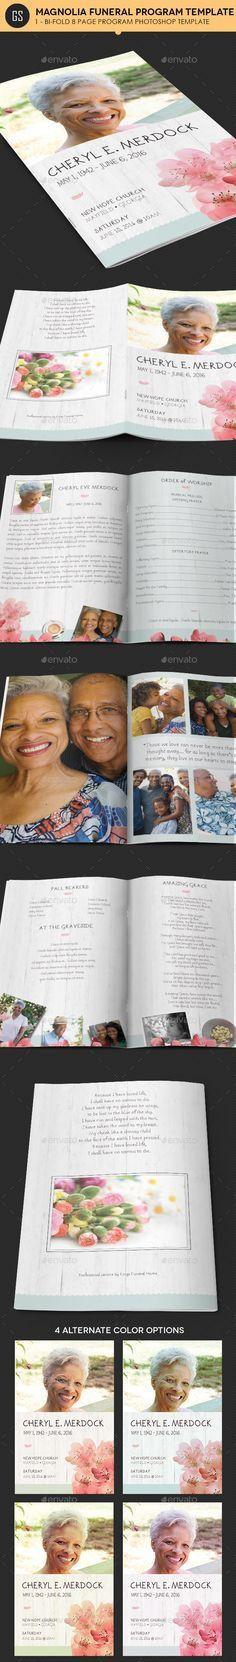 Downloadable Funeral Bulletin Covers | Free Funeral Program ...